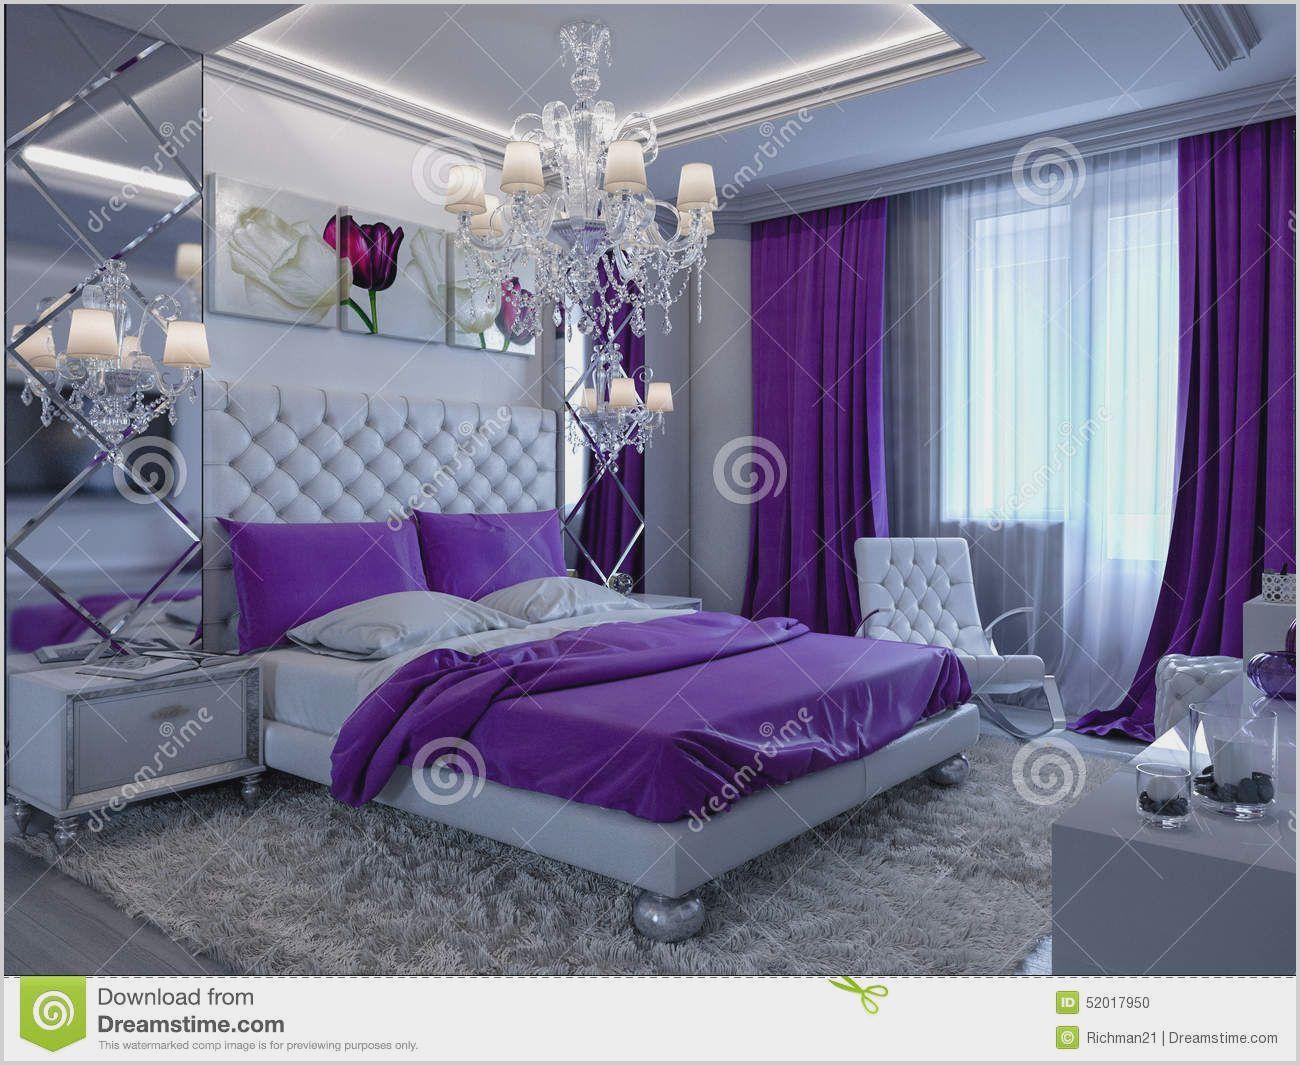 Black White Gray And Purple Bedroom In 2020 Purple Bedroom Decor